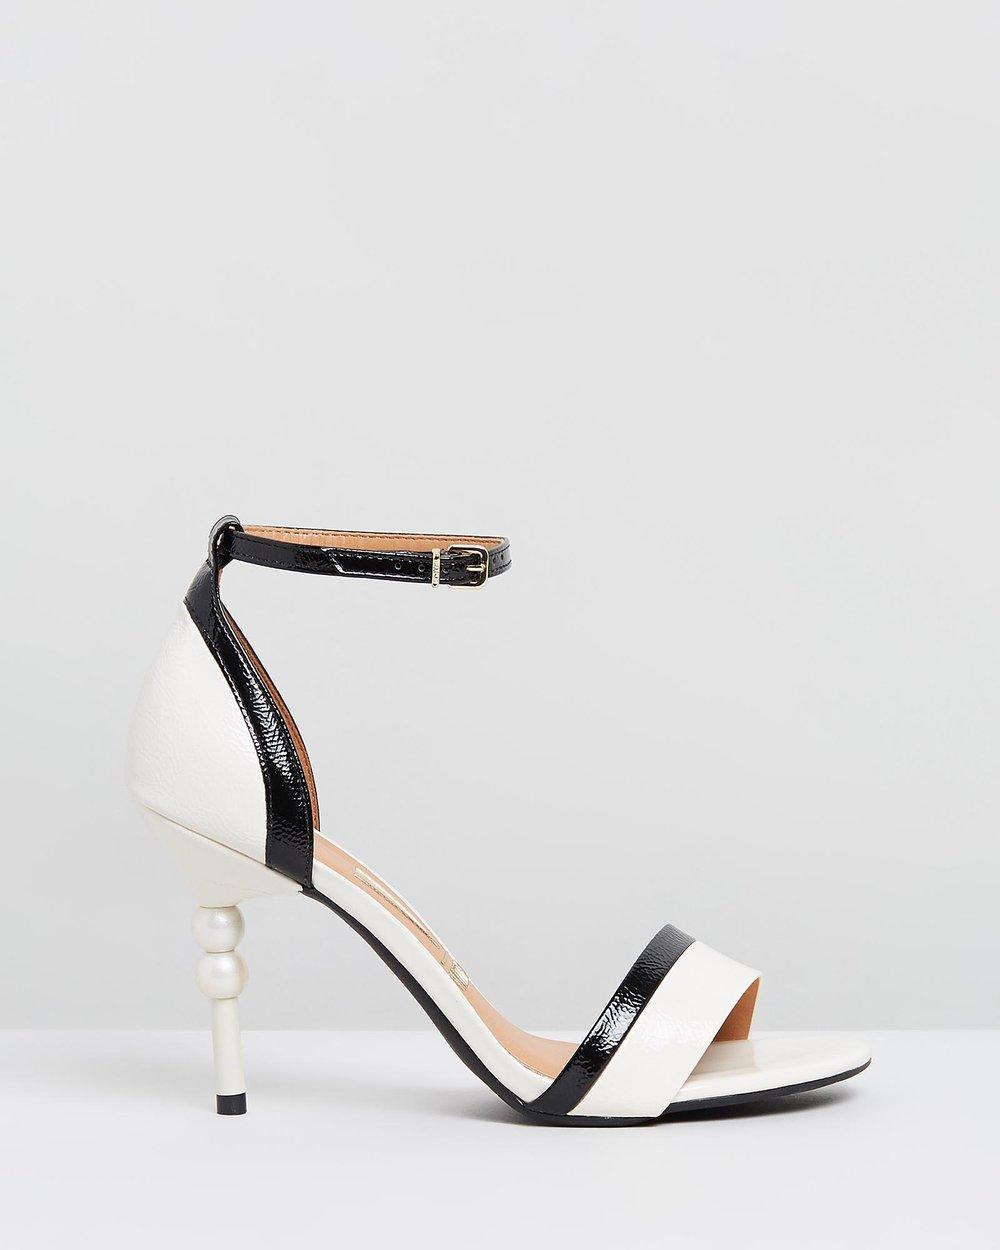 95f92ccde5b Ivie Heeled Sandals by Vizzano Online